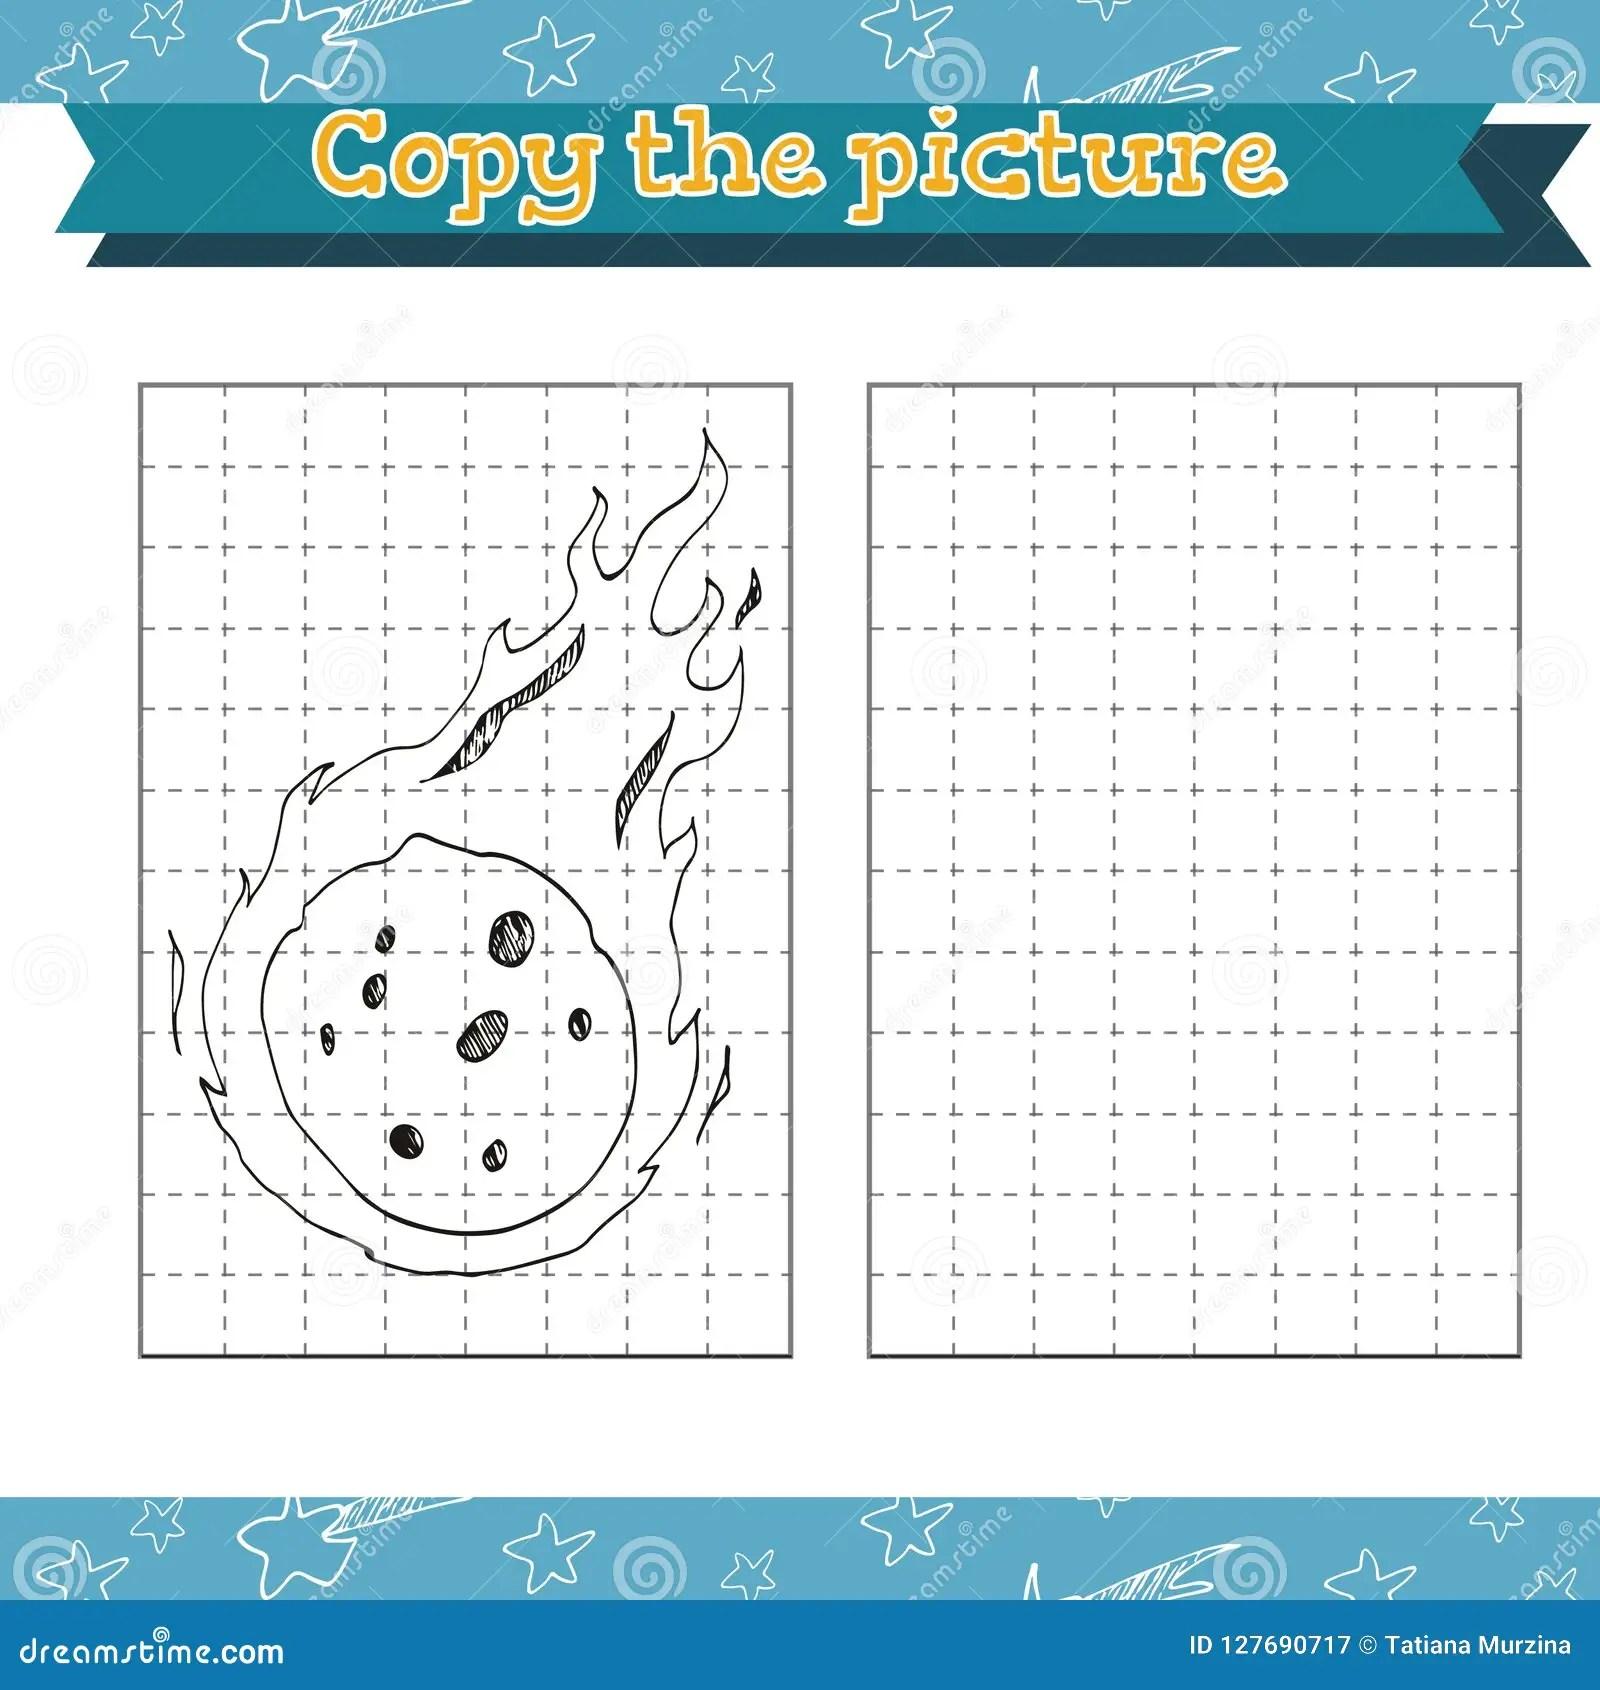 Cosmos Copy The Picture Preschool Or Kindergarten